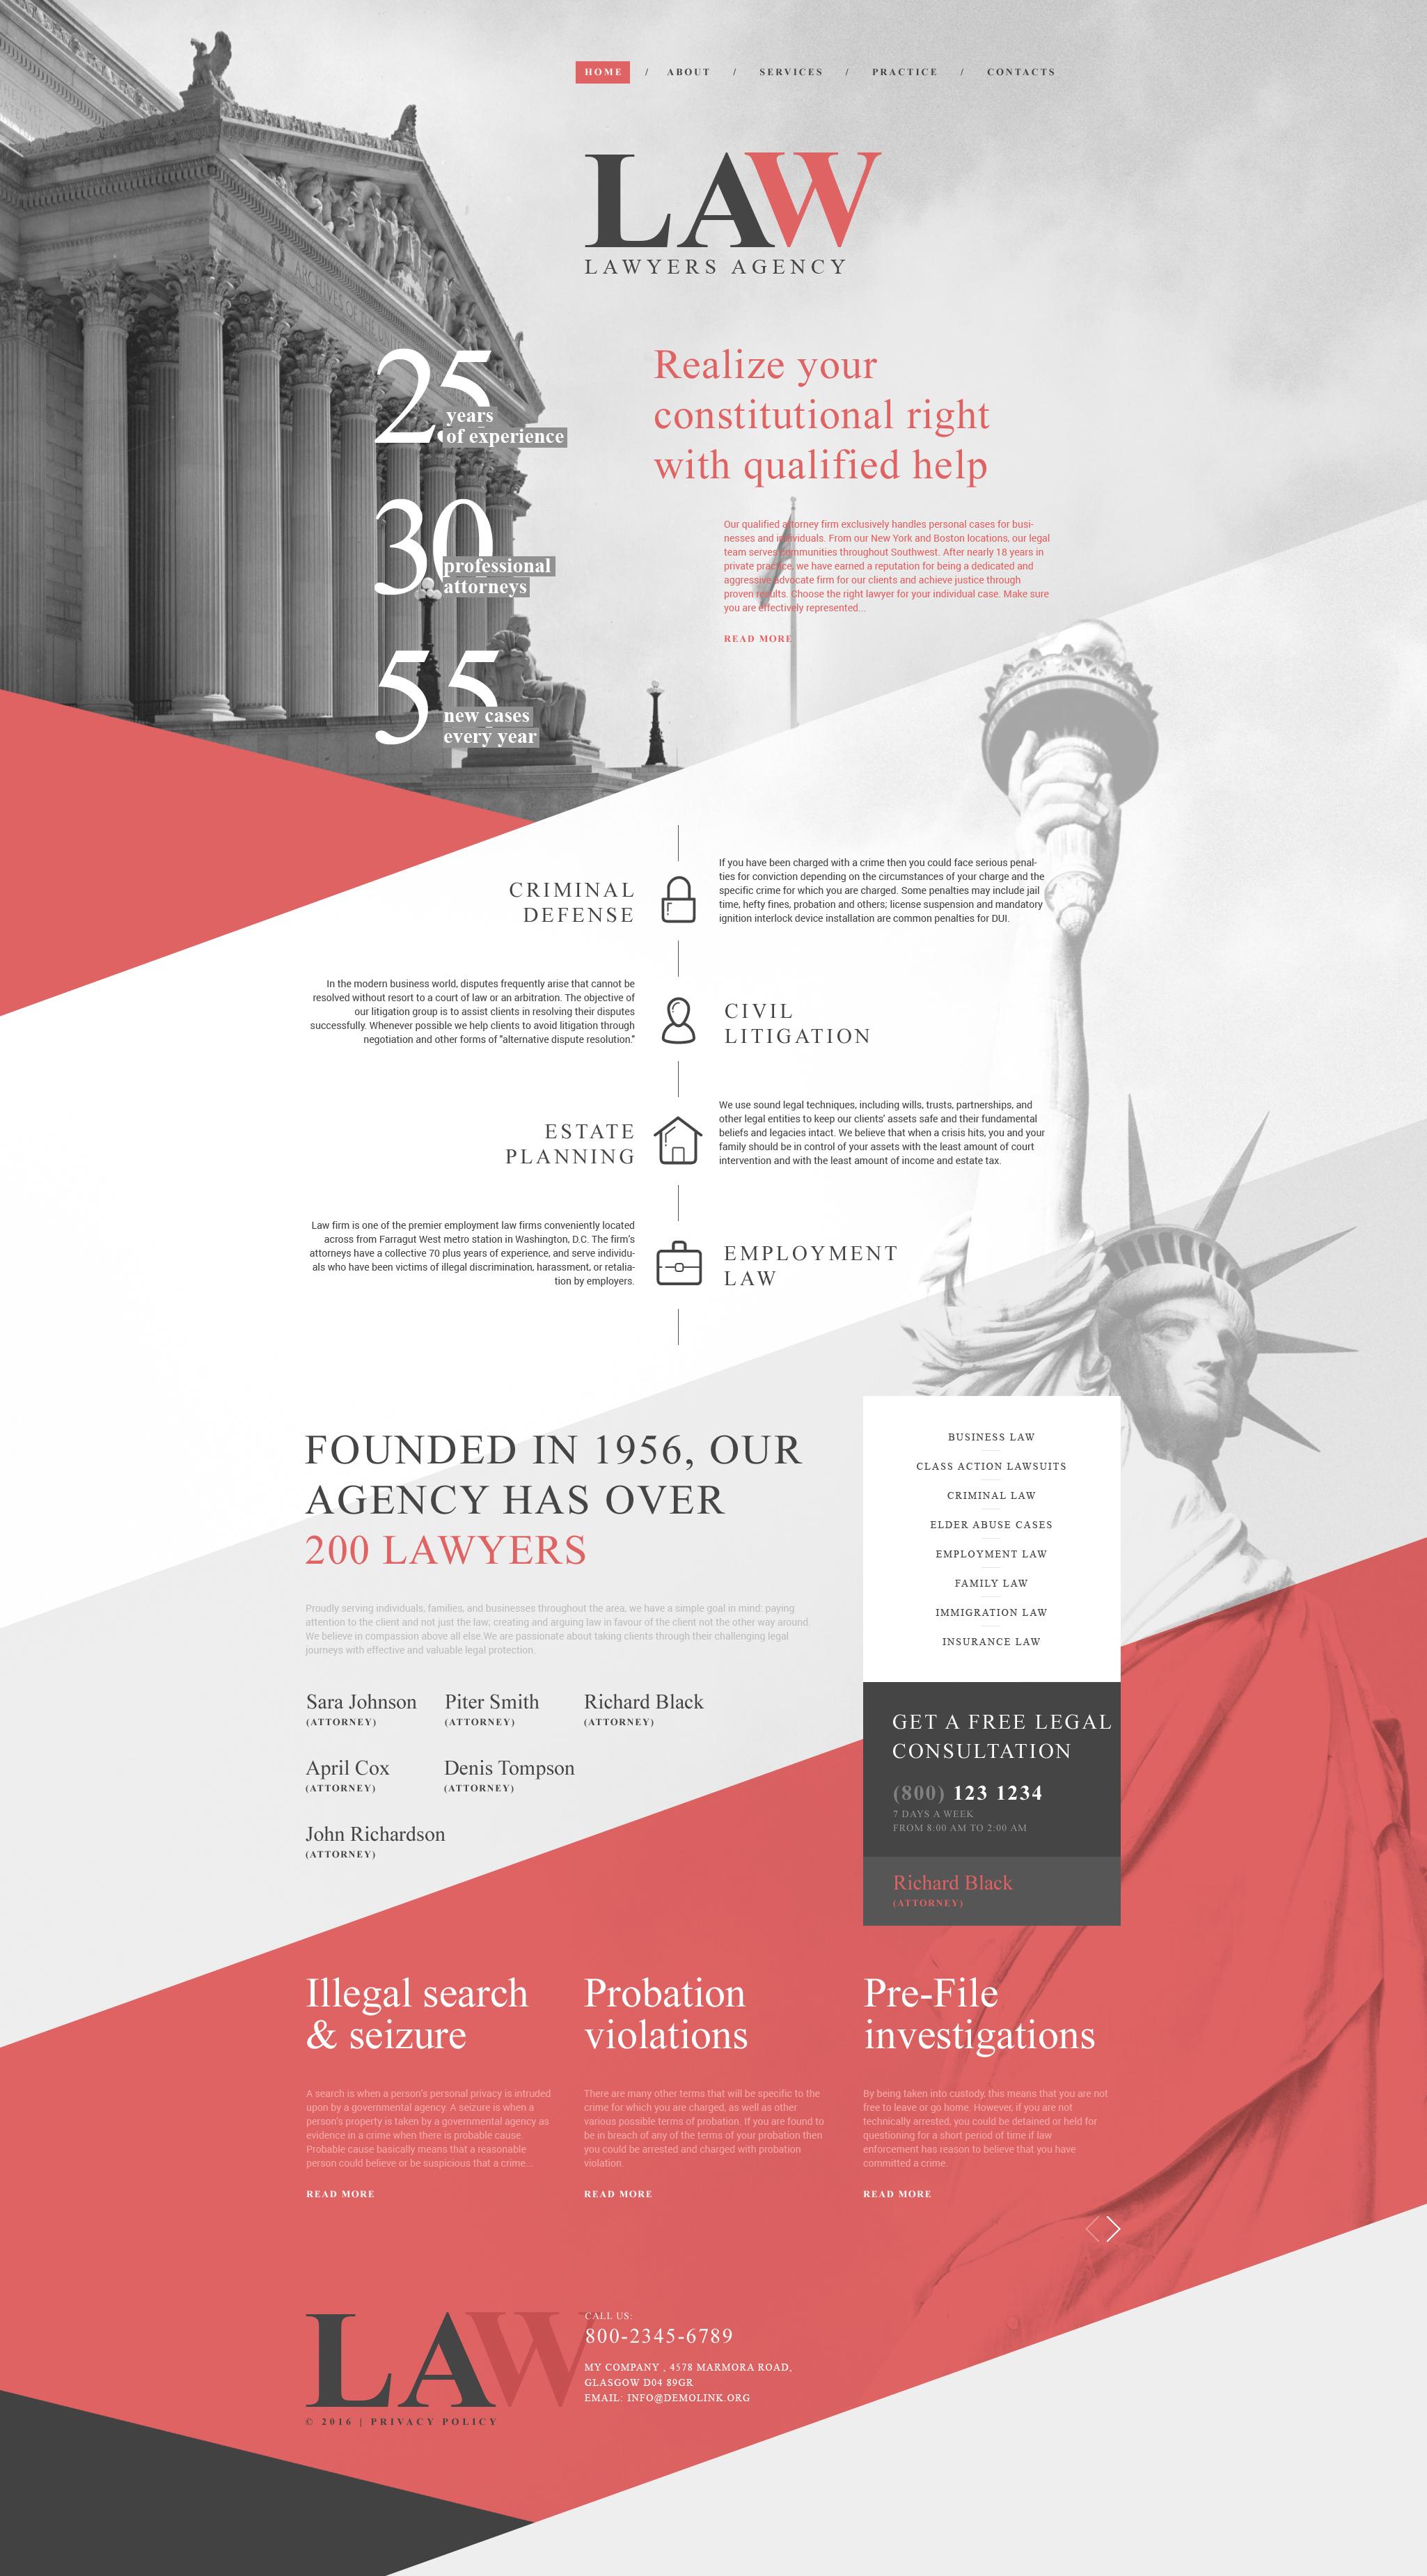 law firm responsive website template 58753. Black Bedroom Furniture Sets. Home Design Ideas